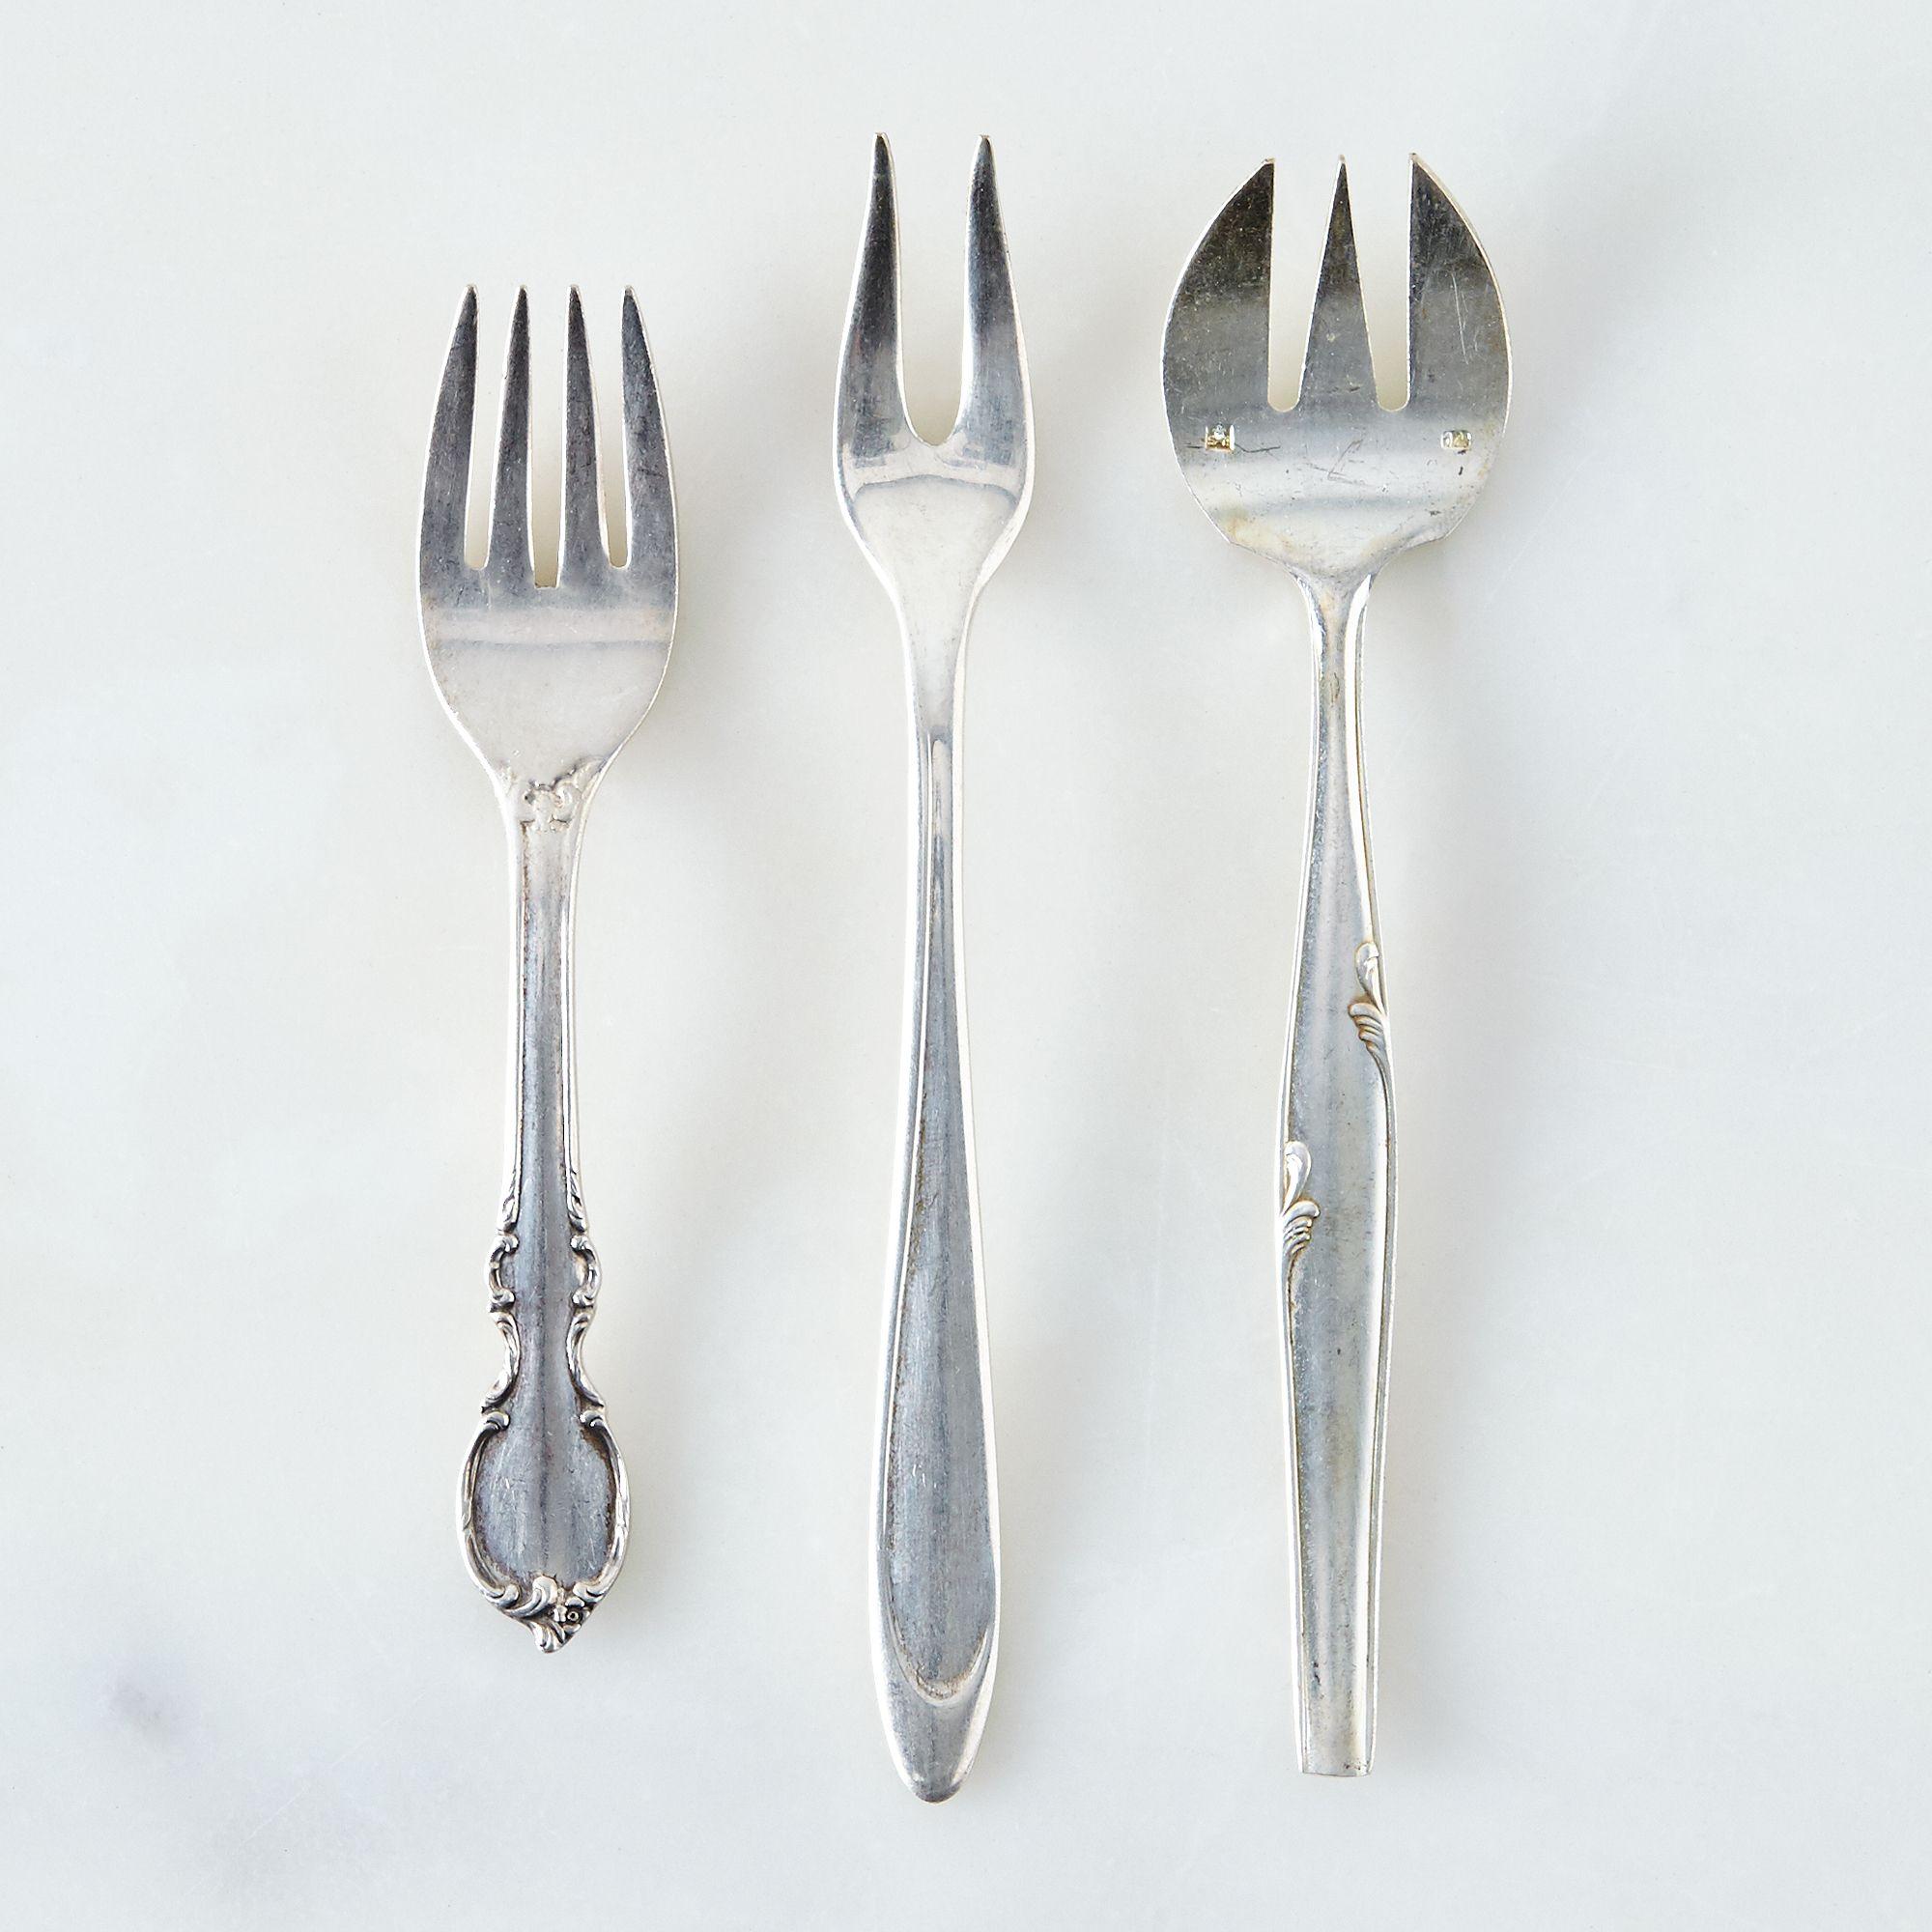 80e5c29f a139 487b bcb8 2408452b53f8  2015 0921 elsie green vintage relish fork silo rocky luten 010